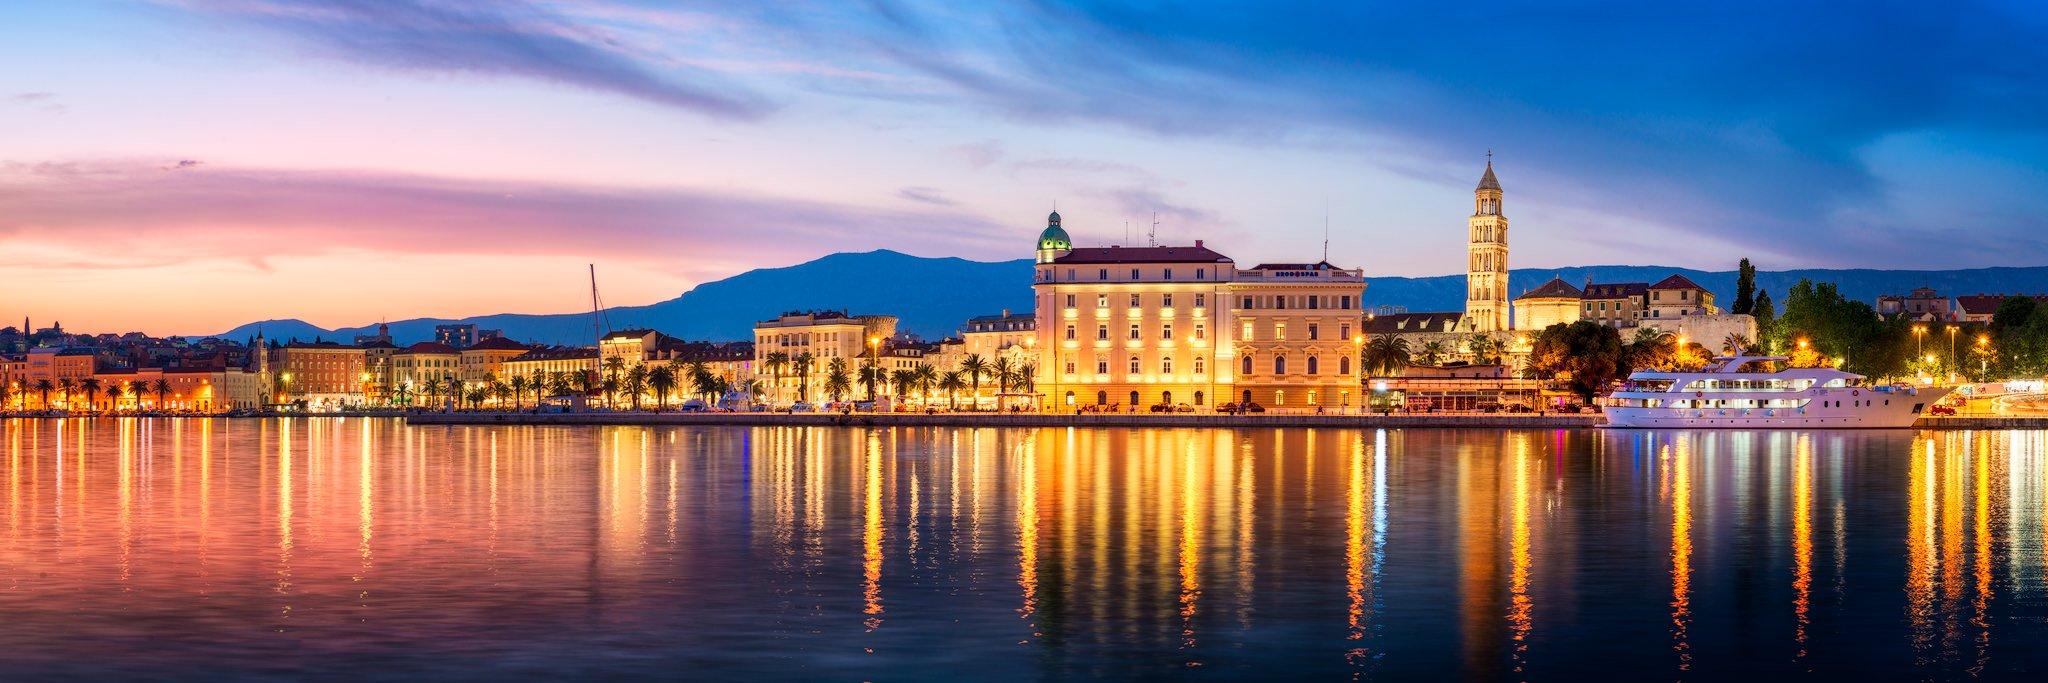 Split Panorama: Promenade, Diocletian's Palace and Port - Croatia in summer